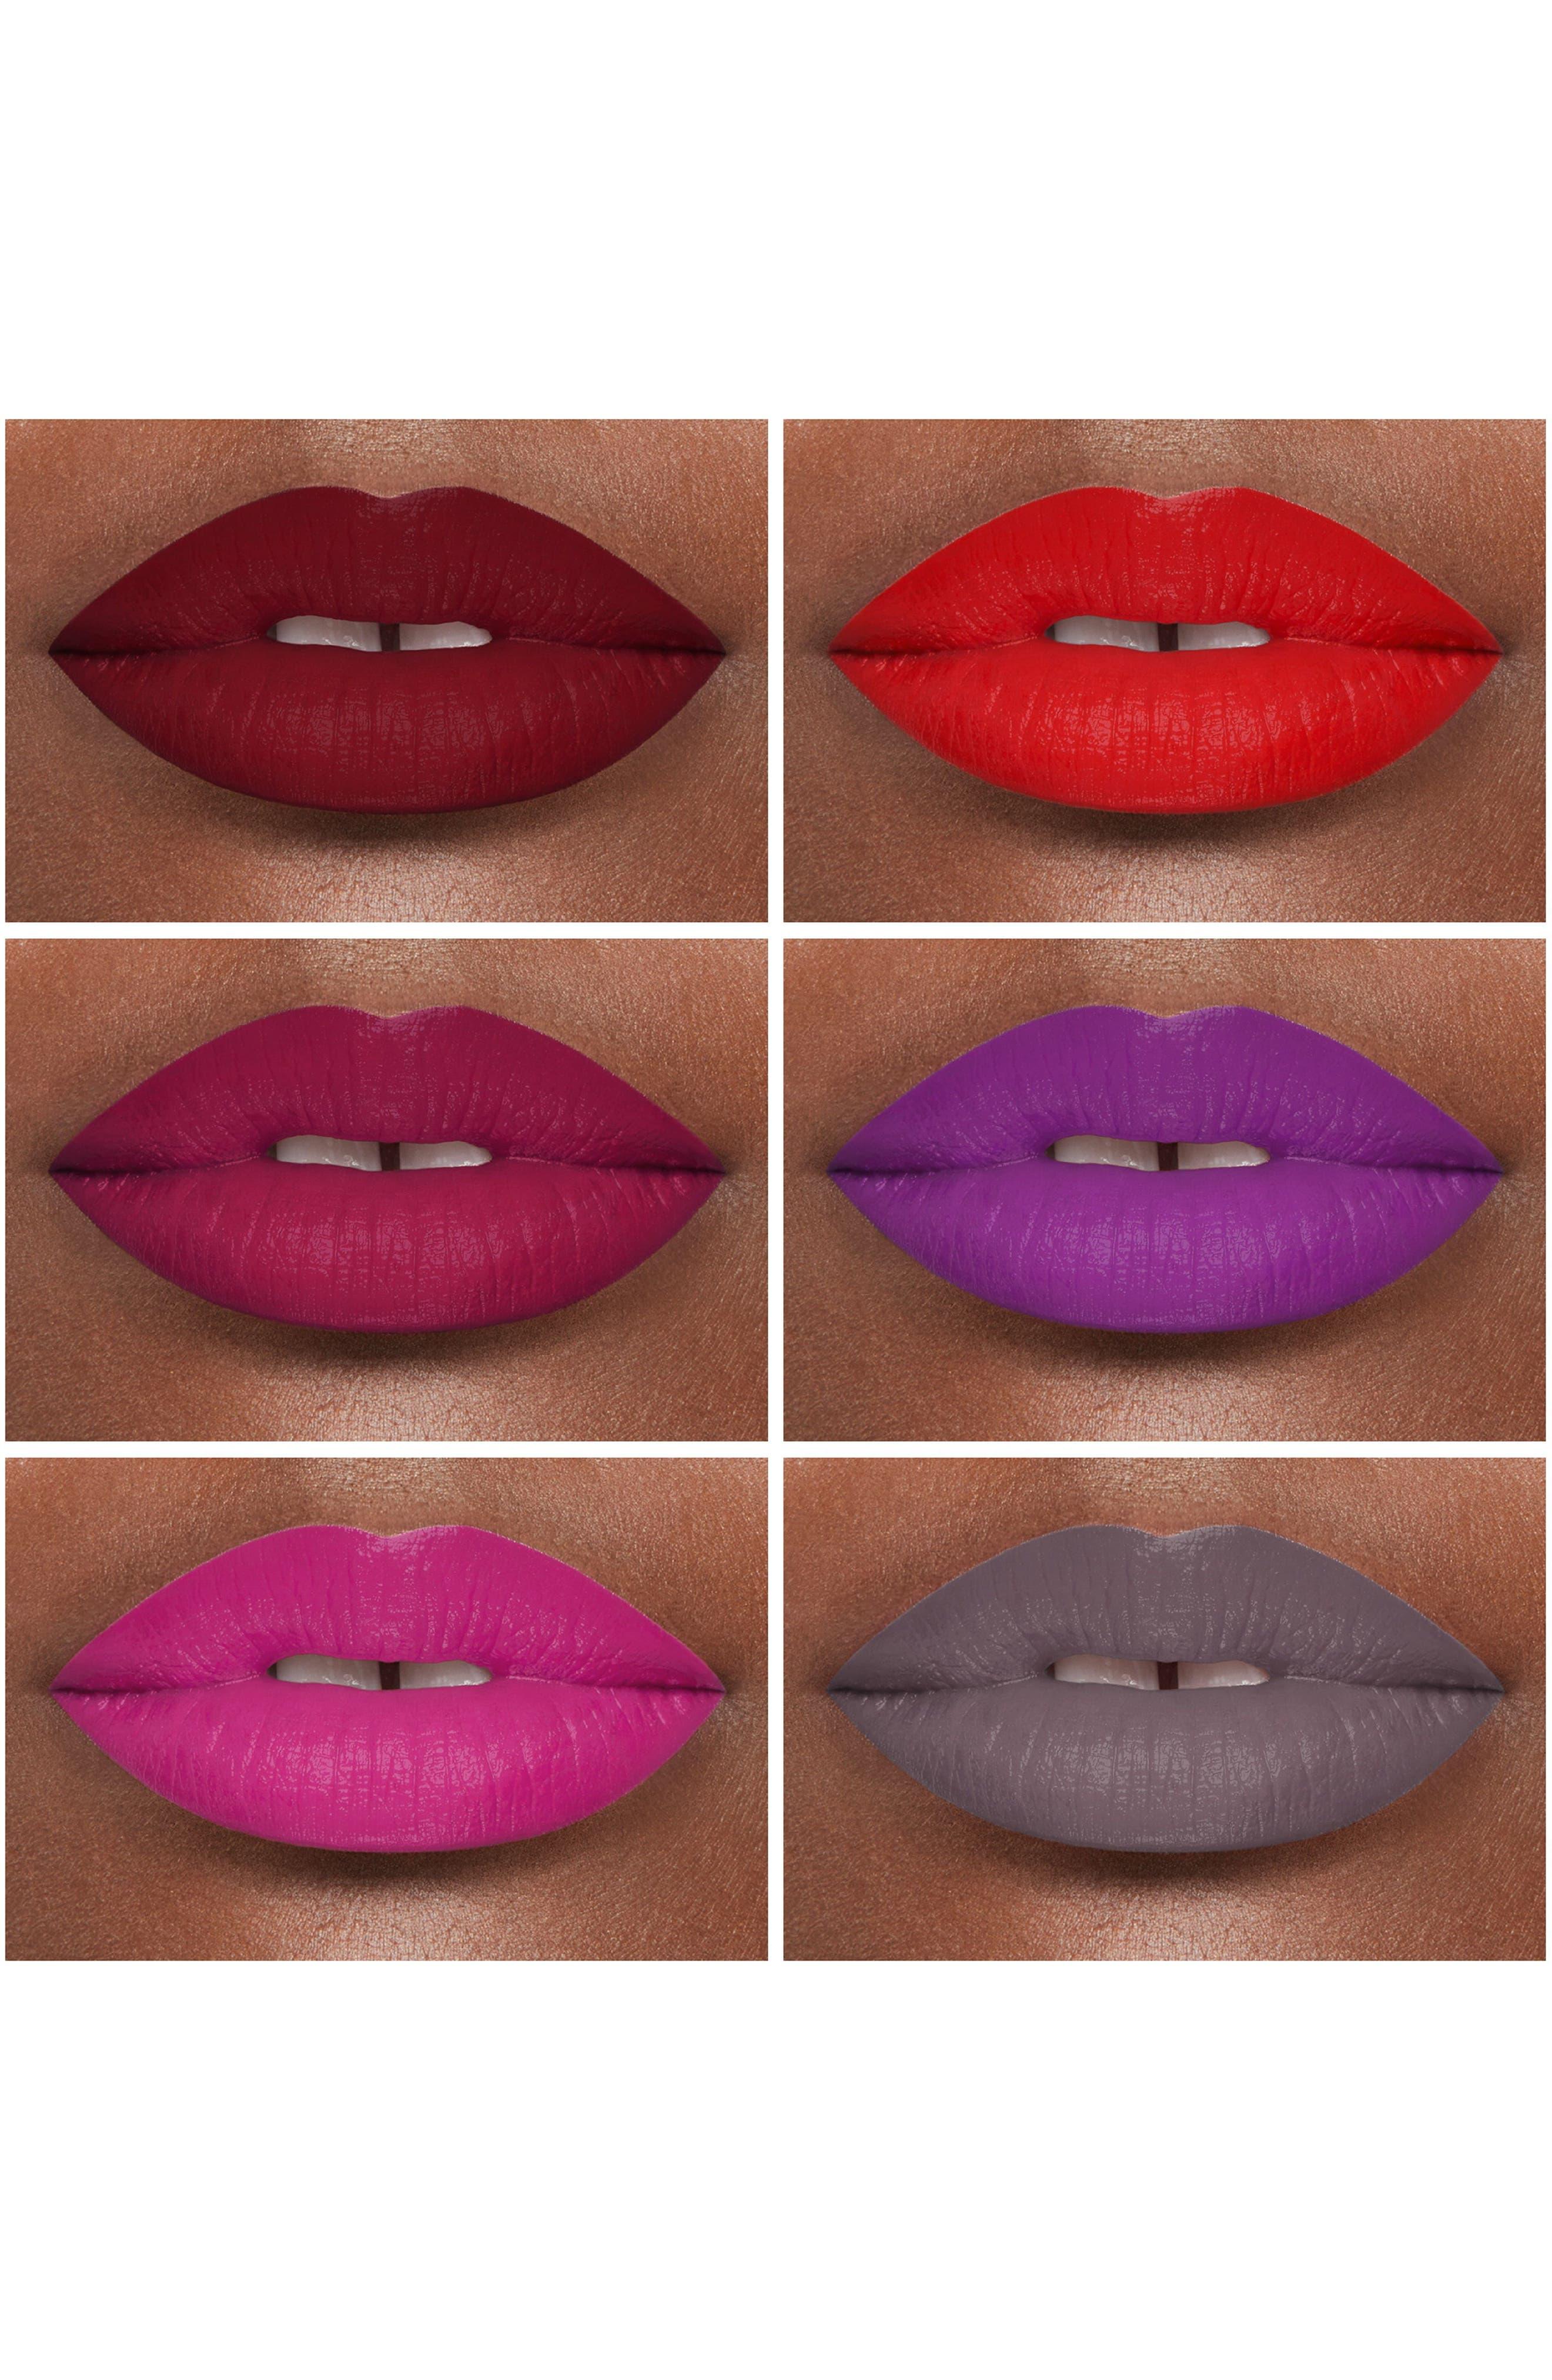 Be Legendary Pucker Up Lipstick Palette,                             Alternate thumbnail 5, color,                             BOLD